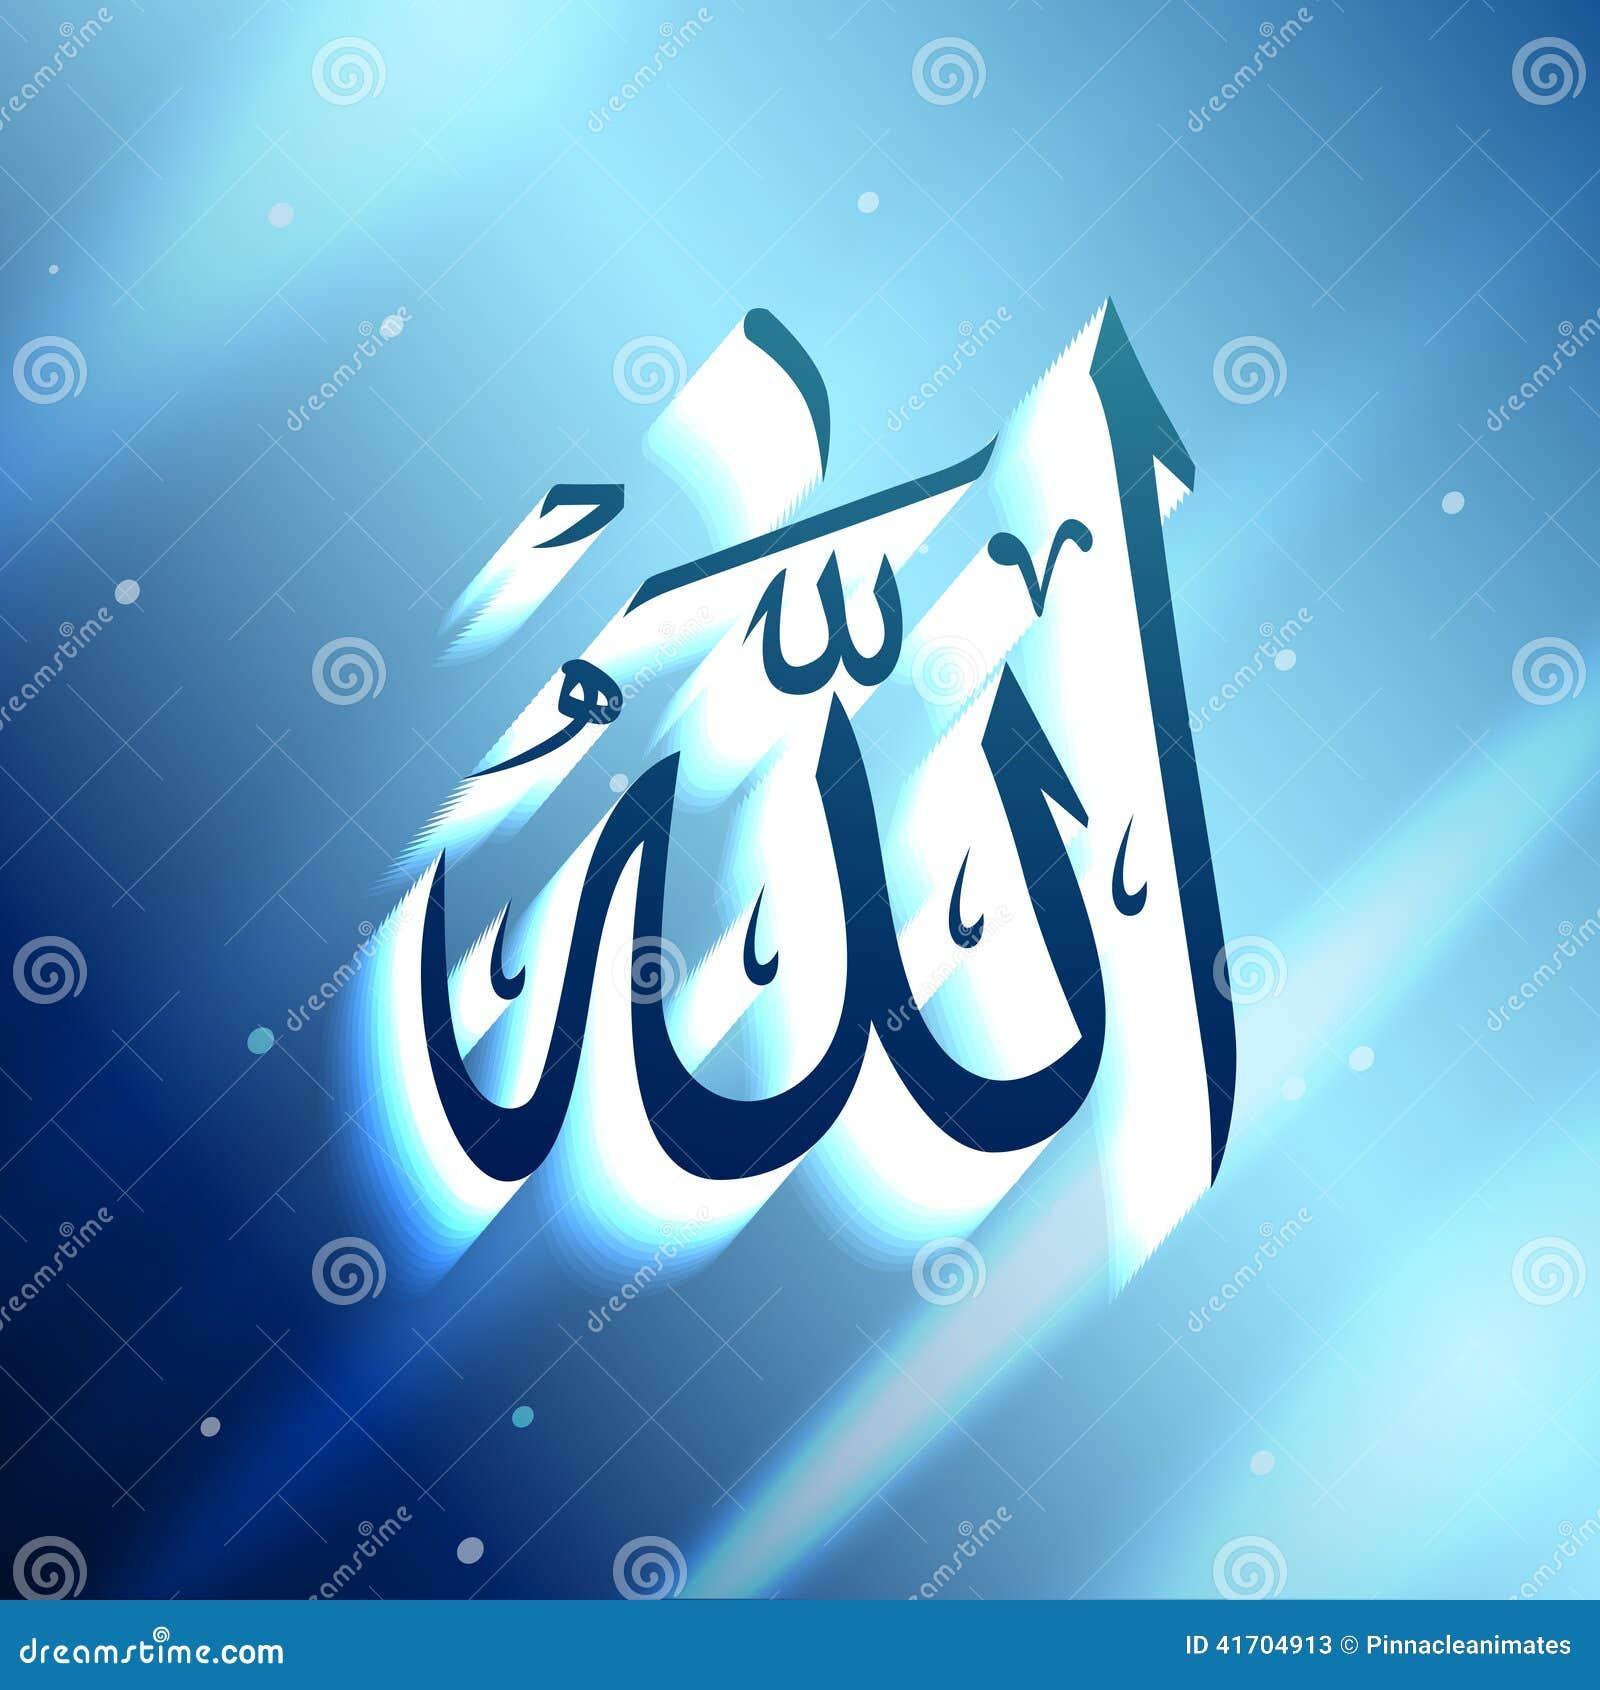 Download 920+ Background Islami Modern HD Gratis